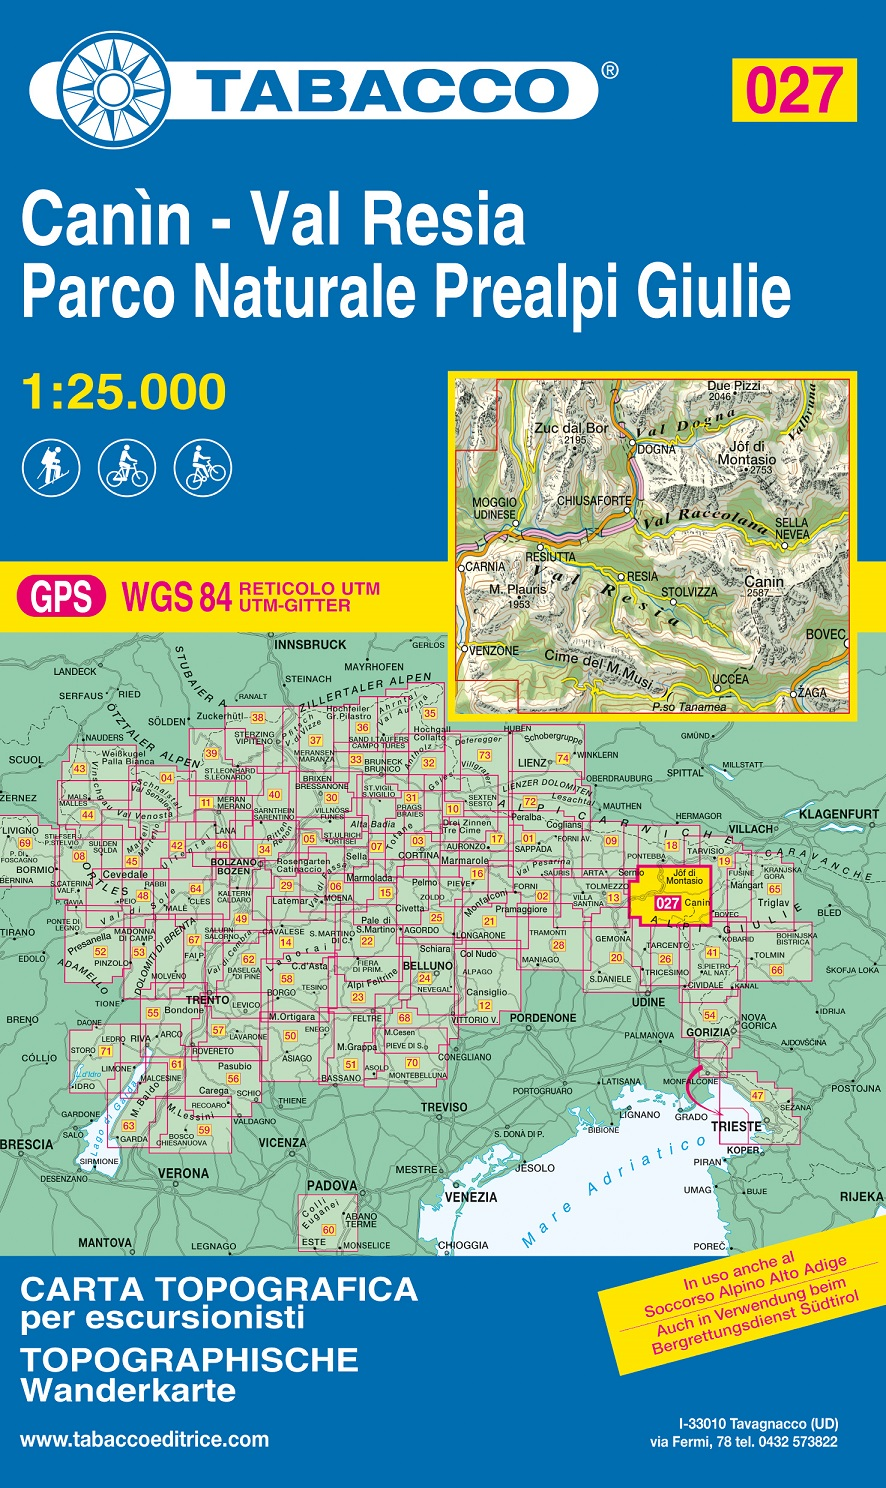 TAB-027  Canin - Valli di Resia e Raccolana | Tabacco wandelkaart 9788883151293  Tabacco Tabacco 1:25.000  Wandelkaarten Venetië, Veneto, Friuli